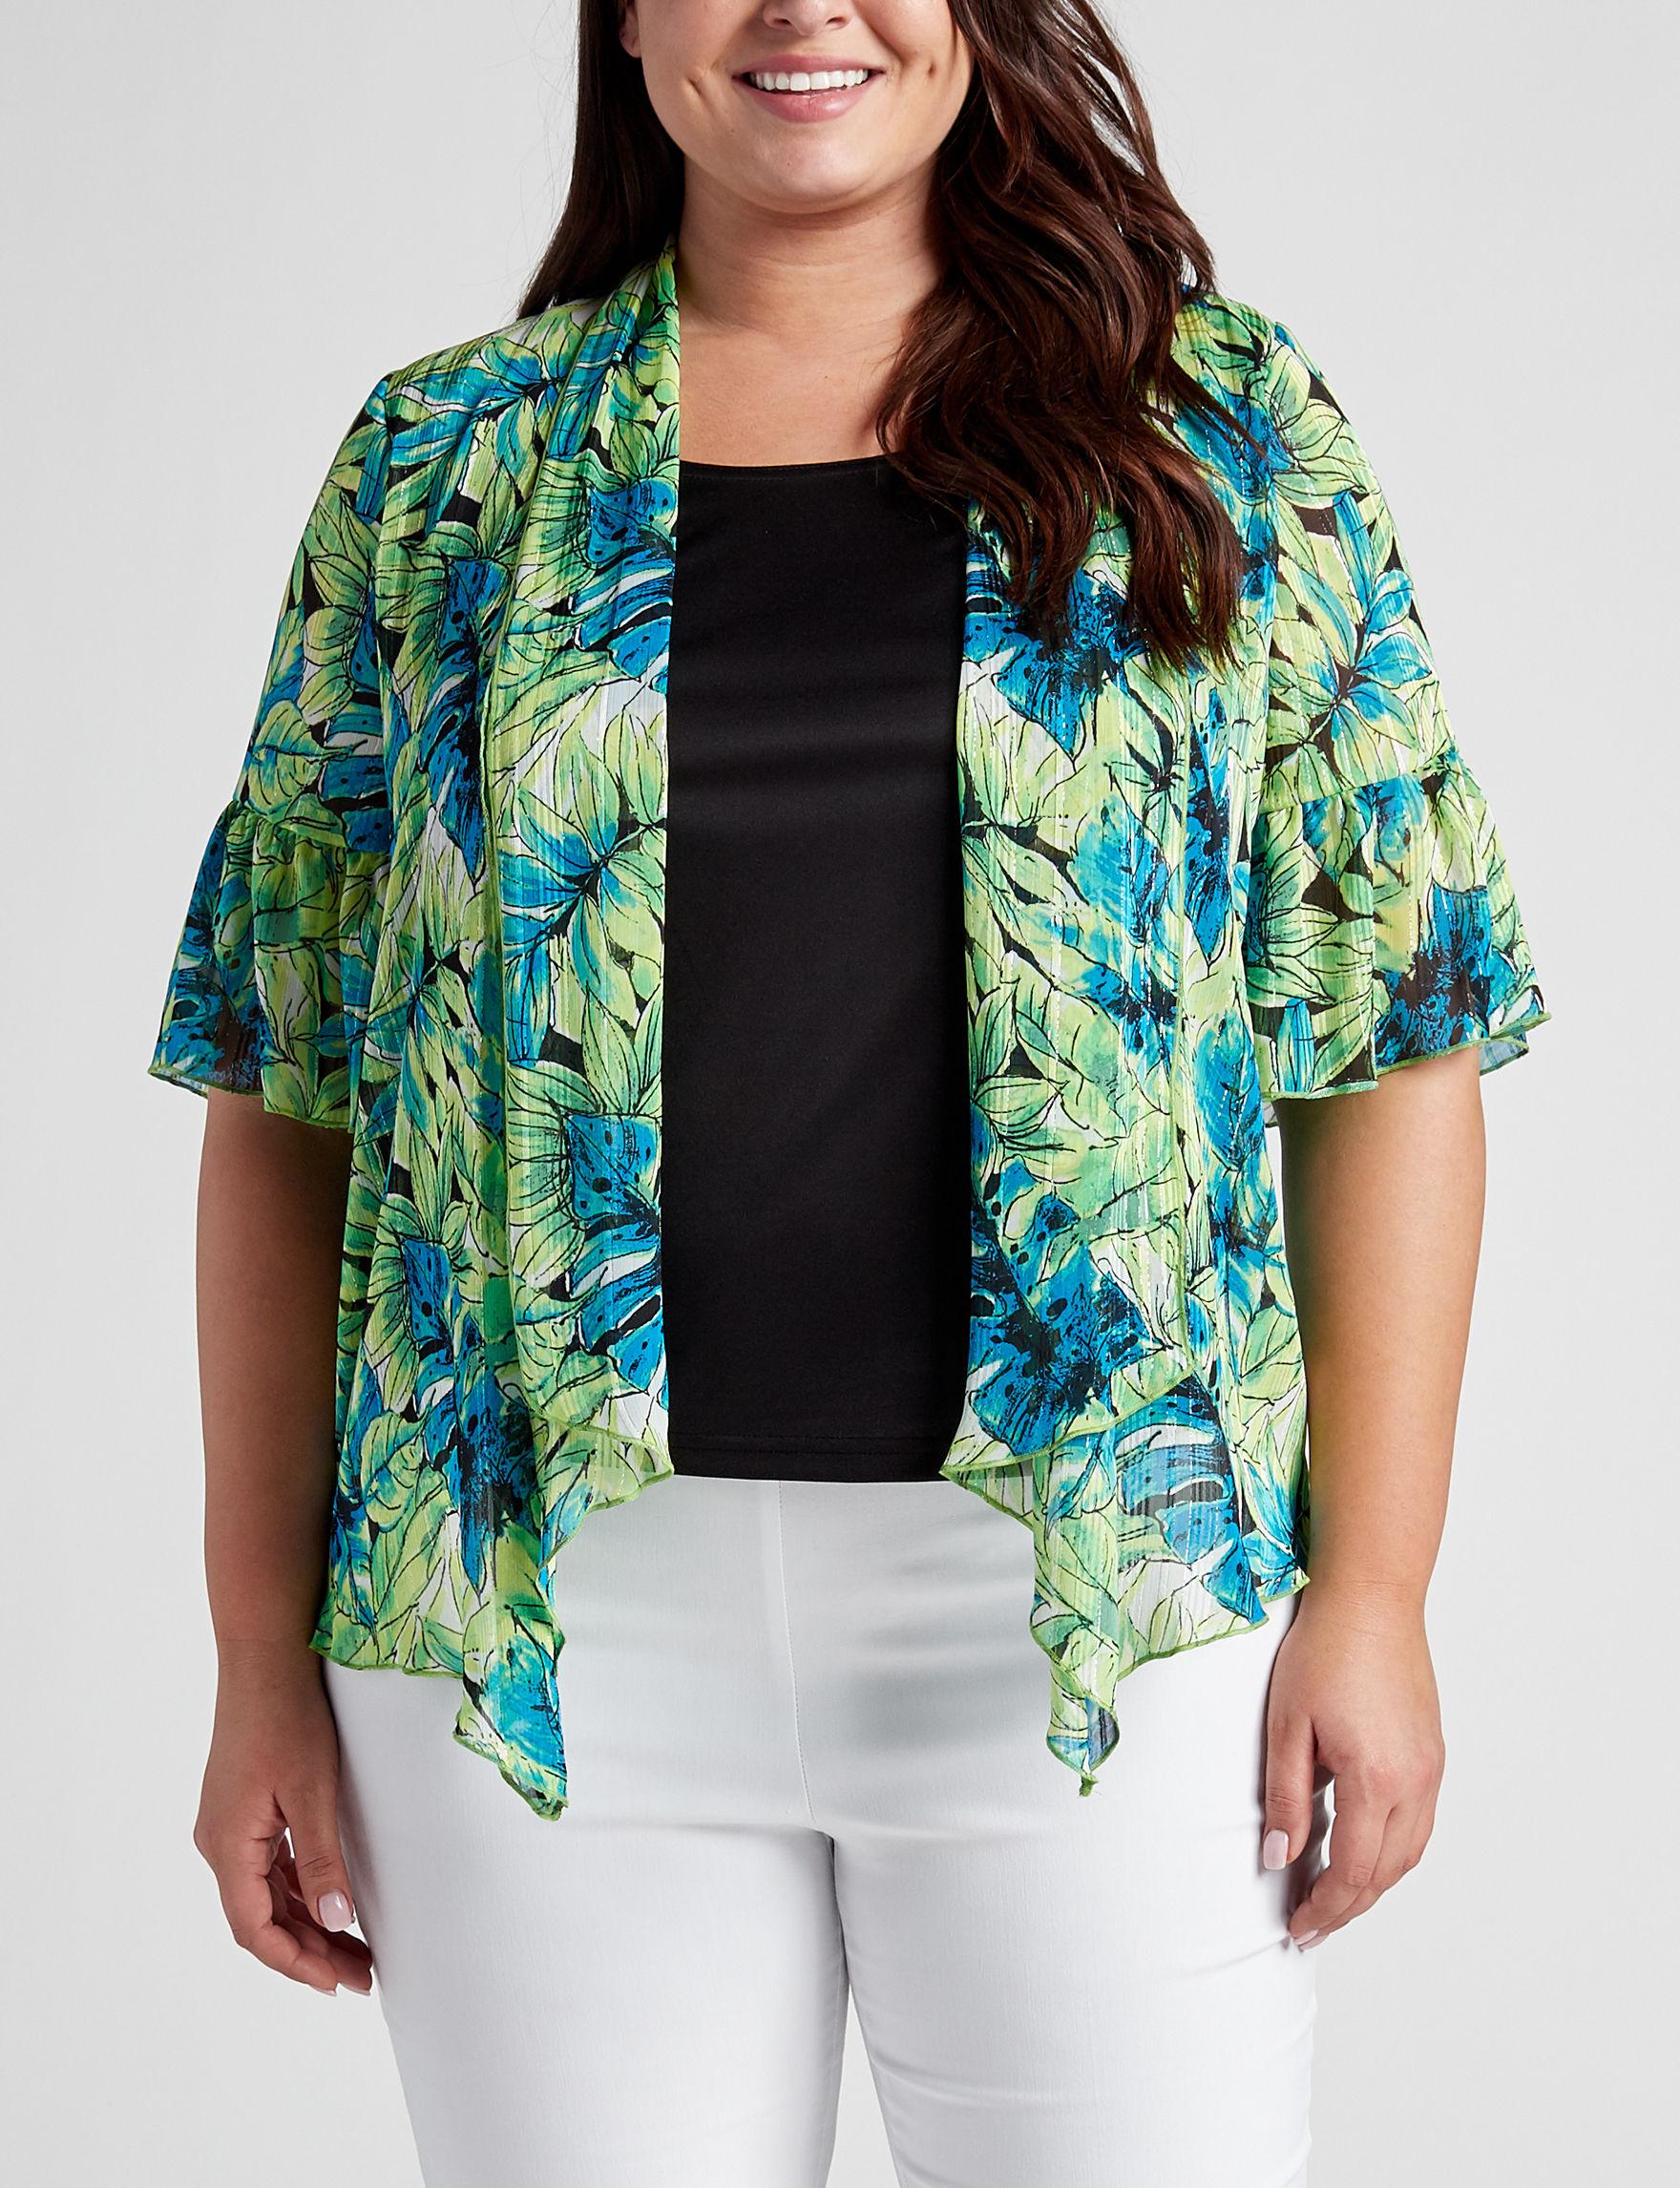 Sara Michelle Green / Black Shirts & Blouses